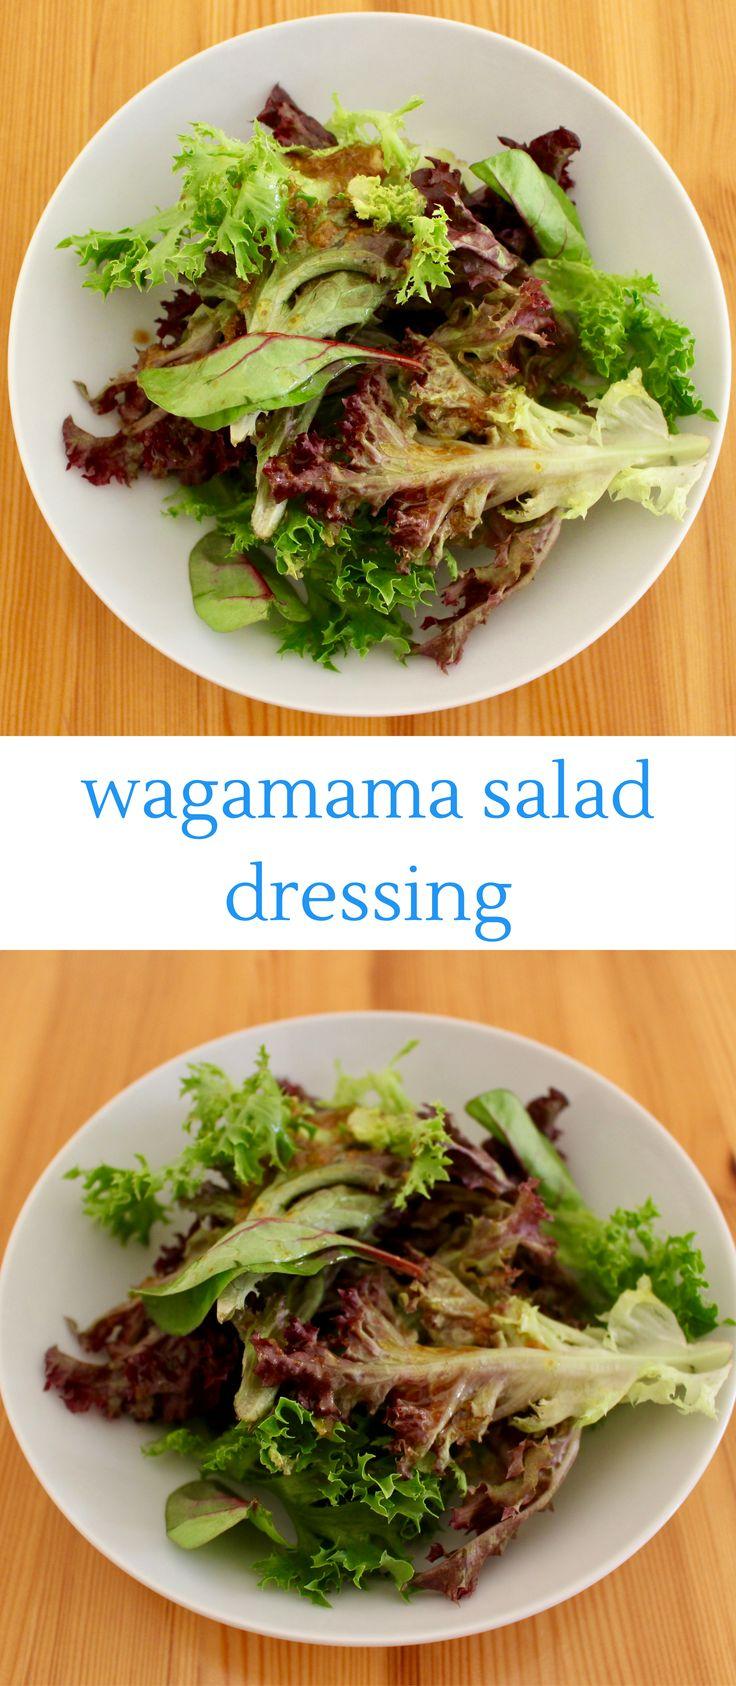 Wagamama Salad Dressing (Vegan + GF)